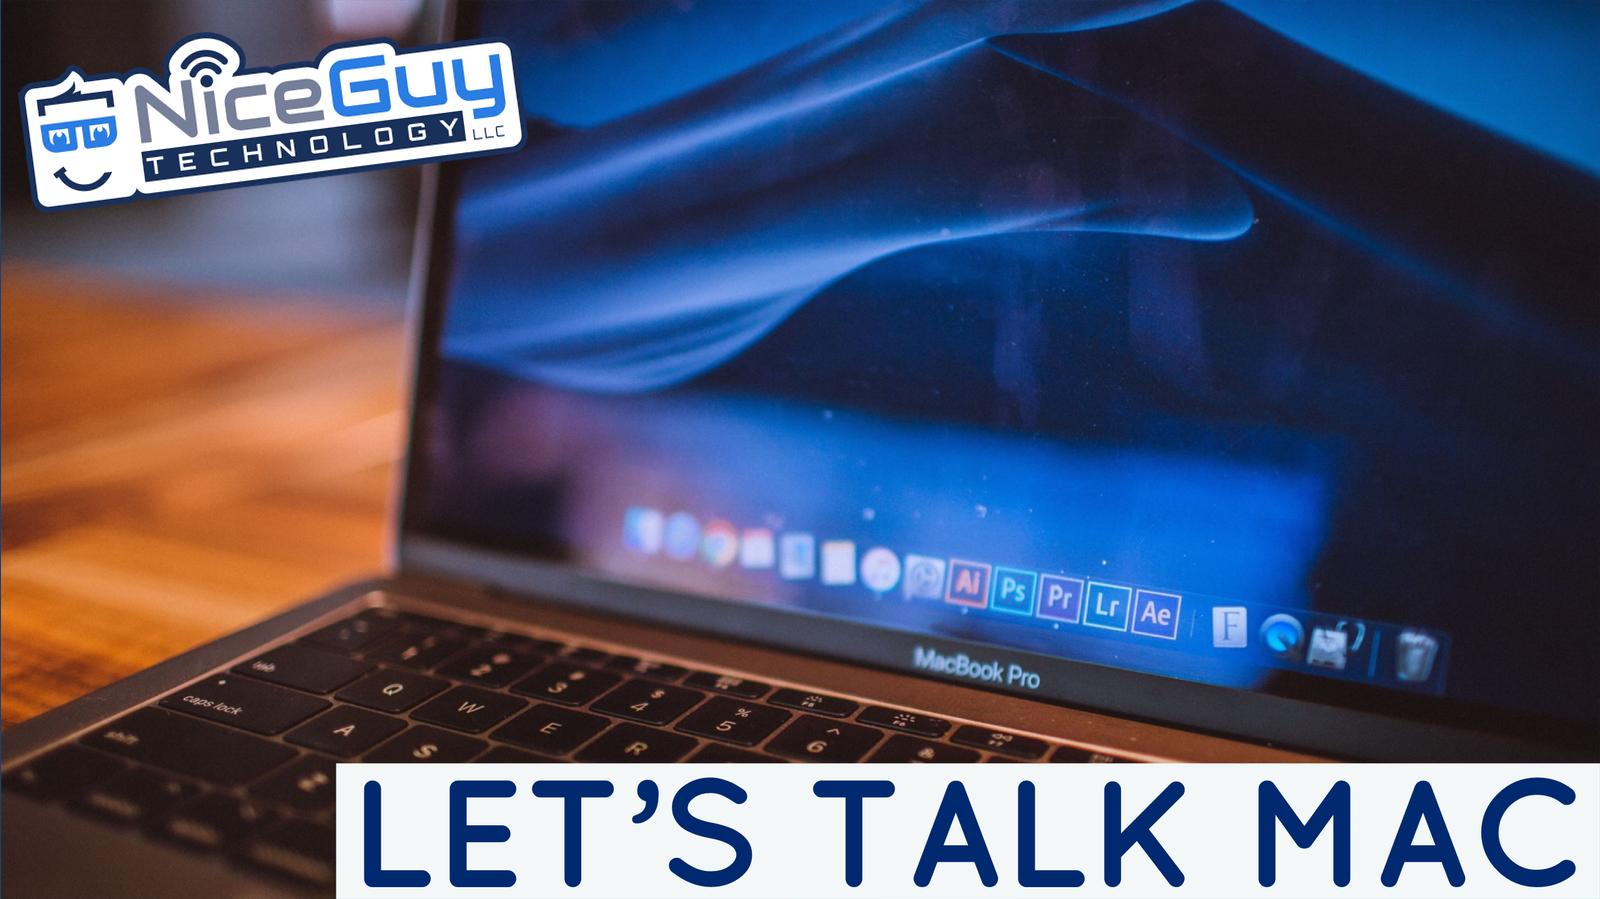 let's talk mac.jpg